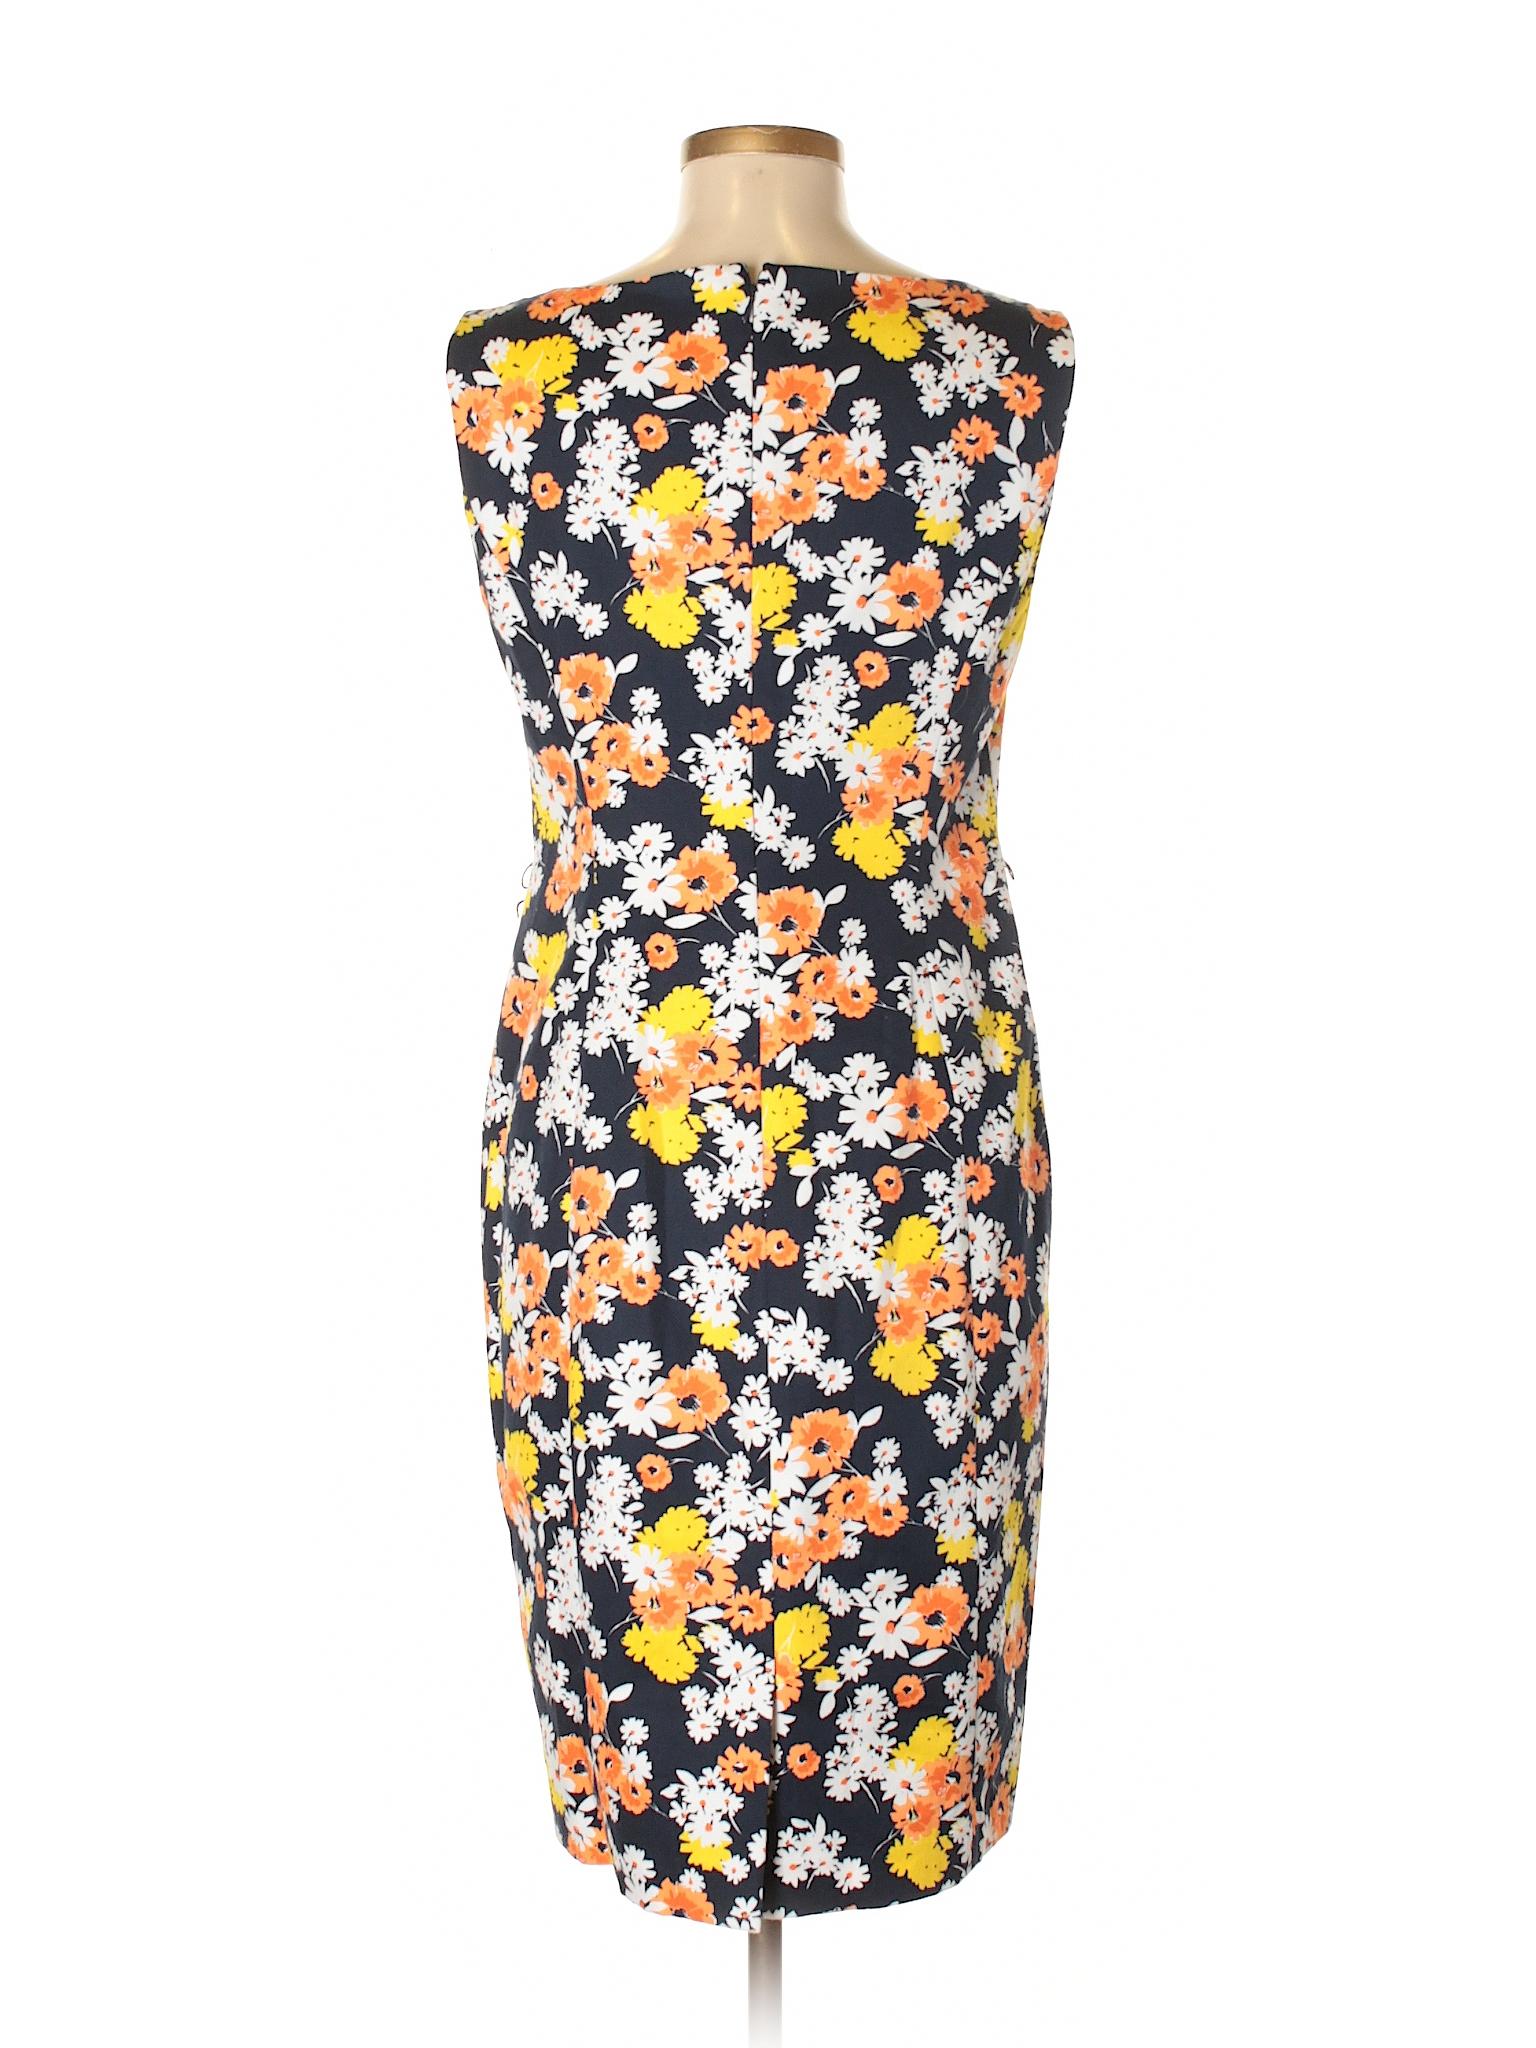 winter Casual Boutique New York Dress Jones Cdd6qxSw